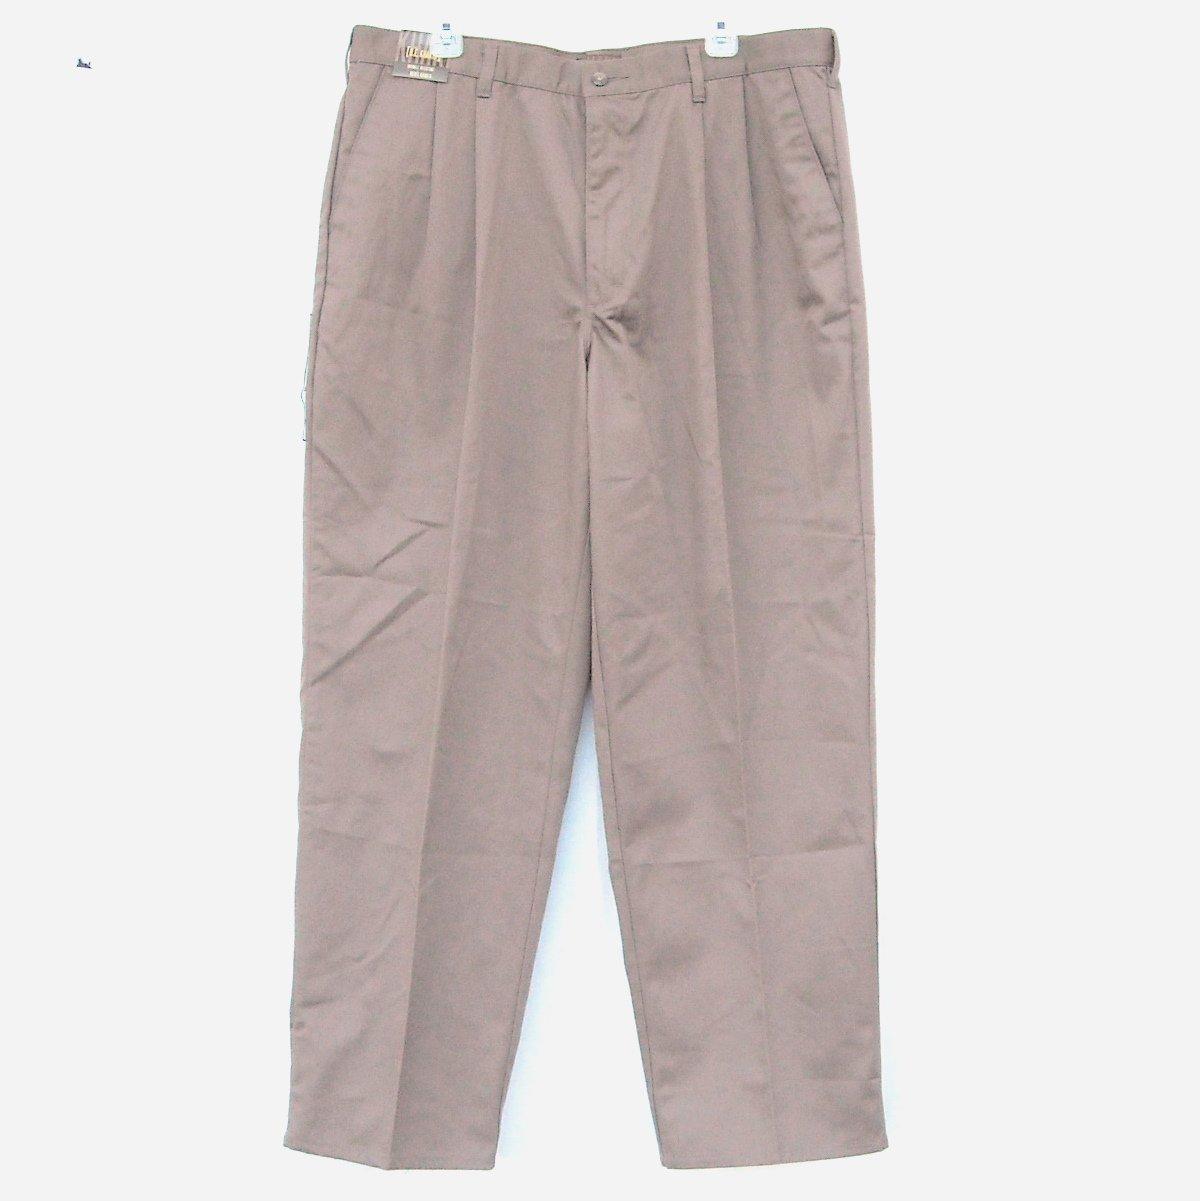 B E Khakis Mens Double Pleat Pants Size 40 x 32 NWT